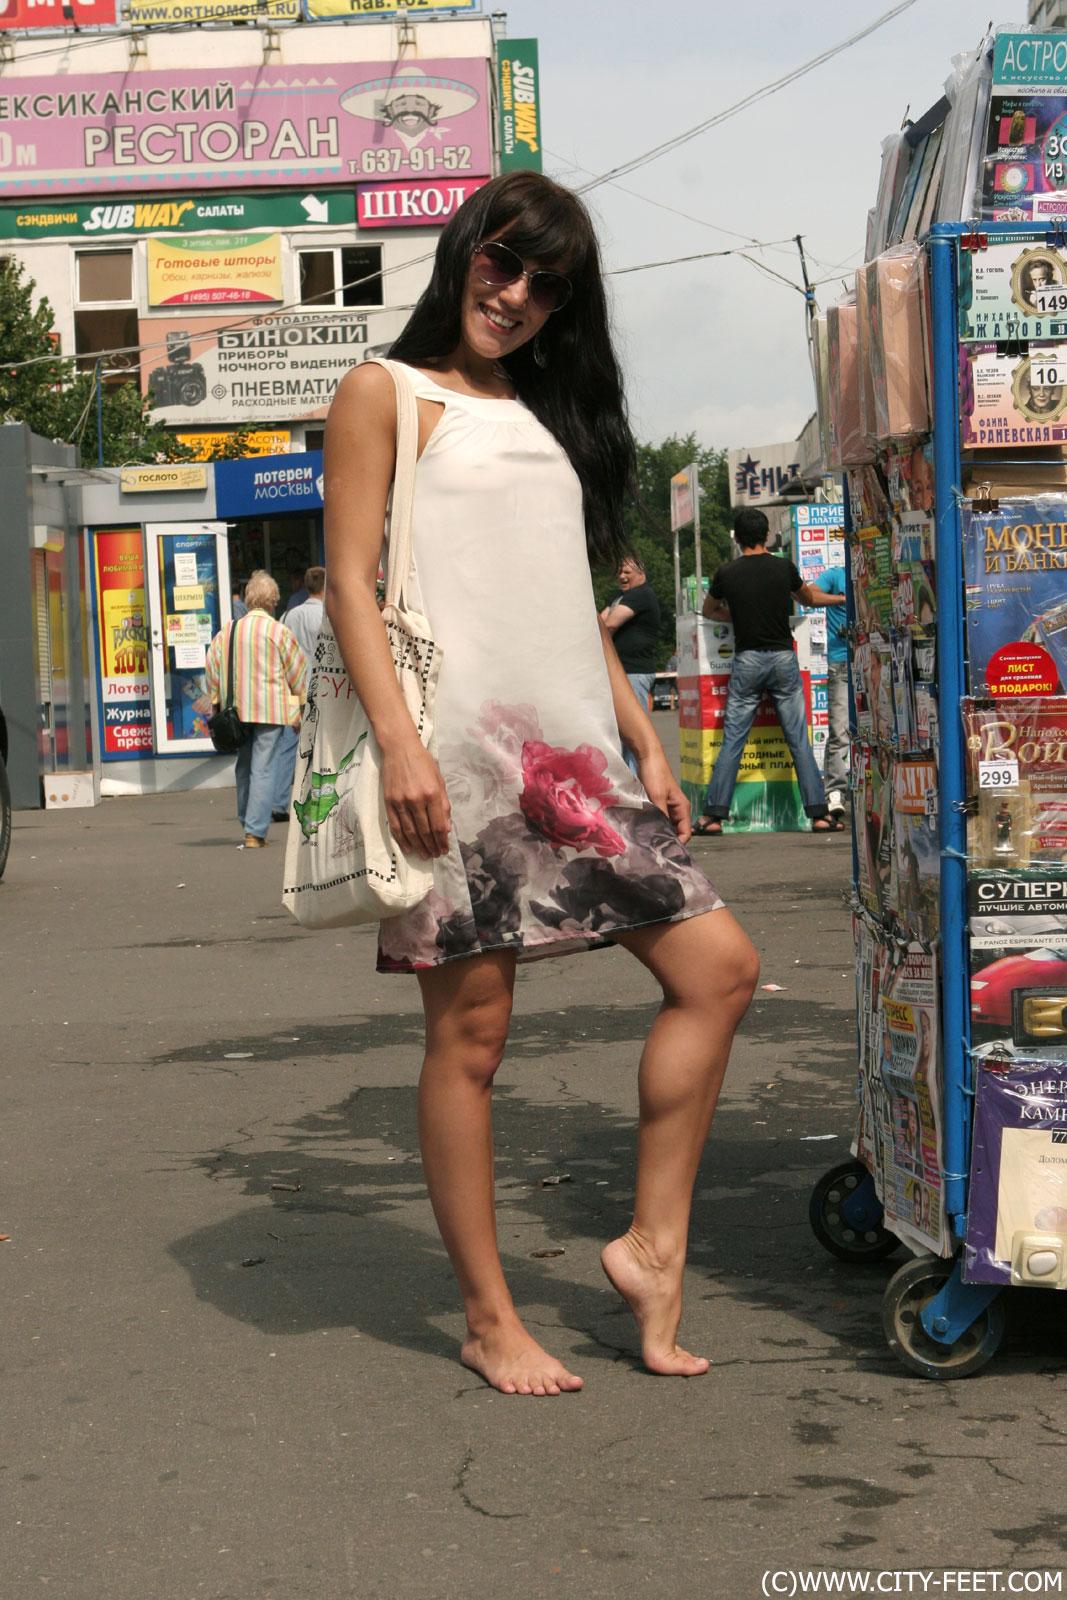 Foot Fetish Forum: Barefoot Urban Girls - weekly update